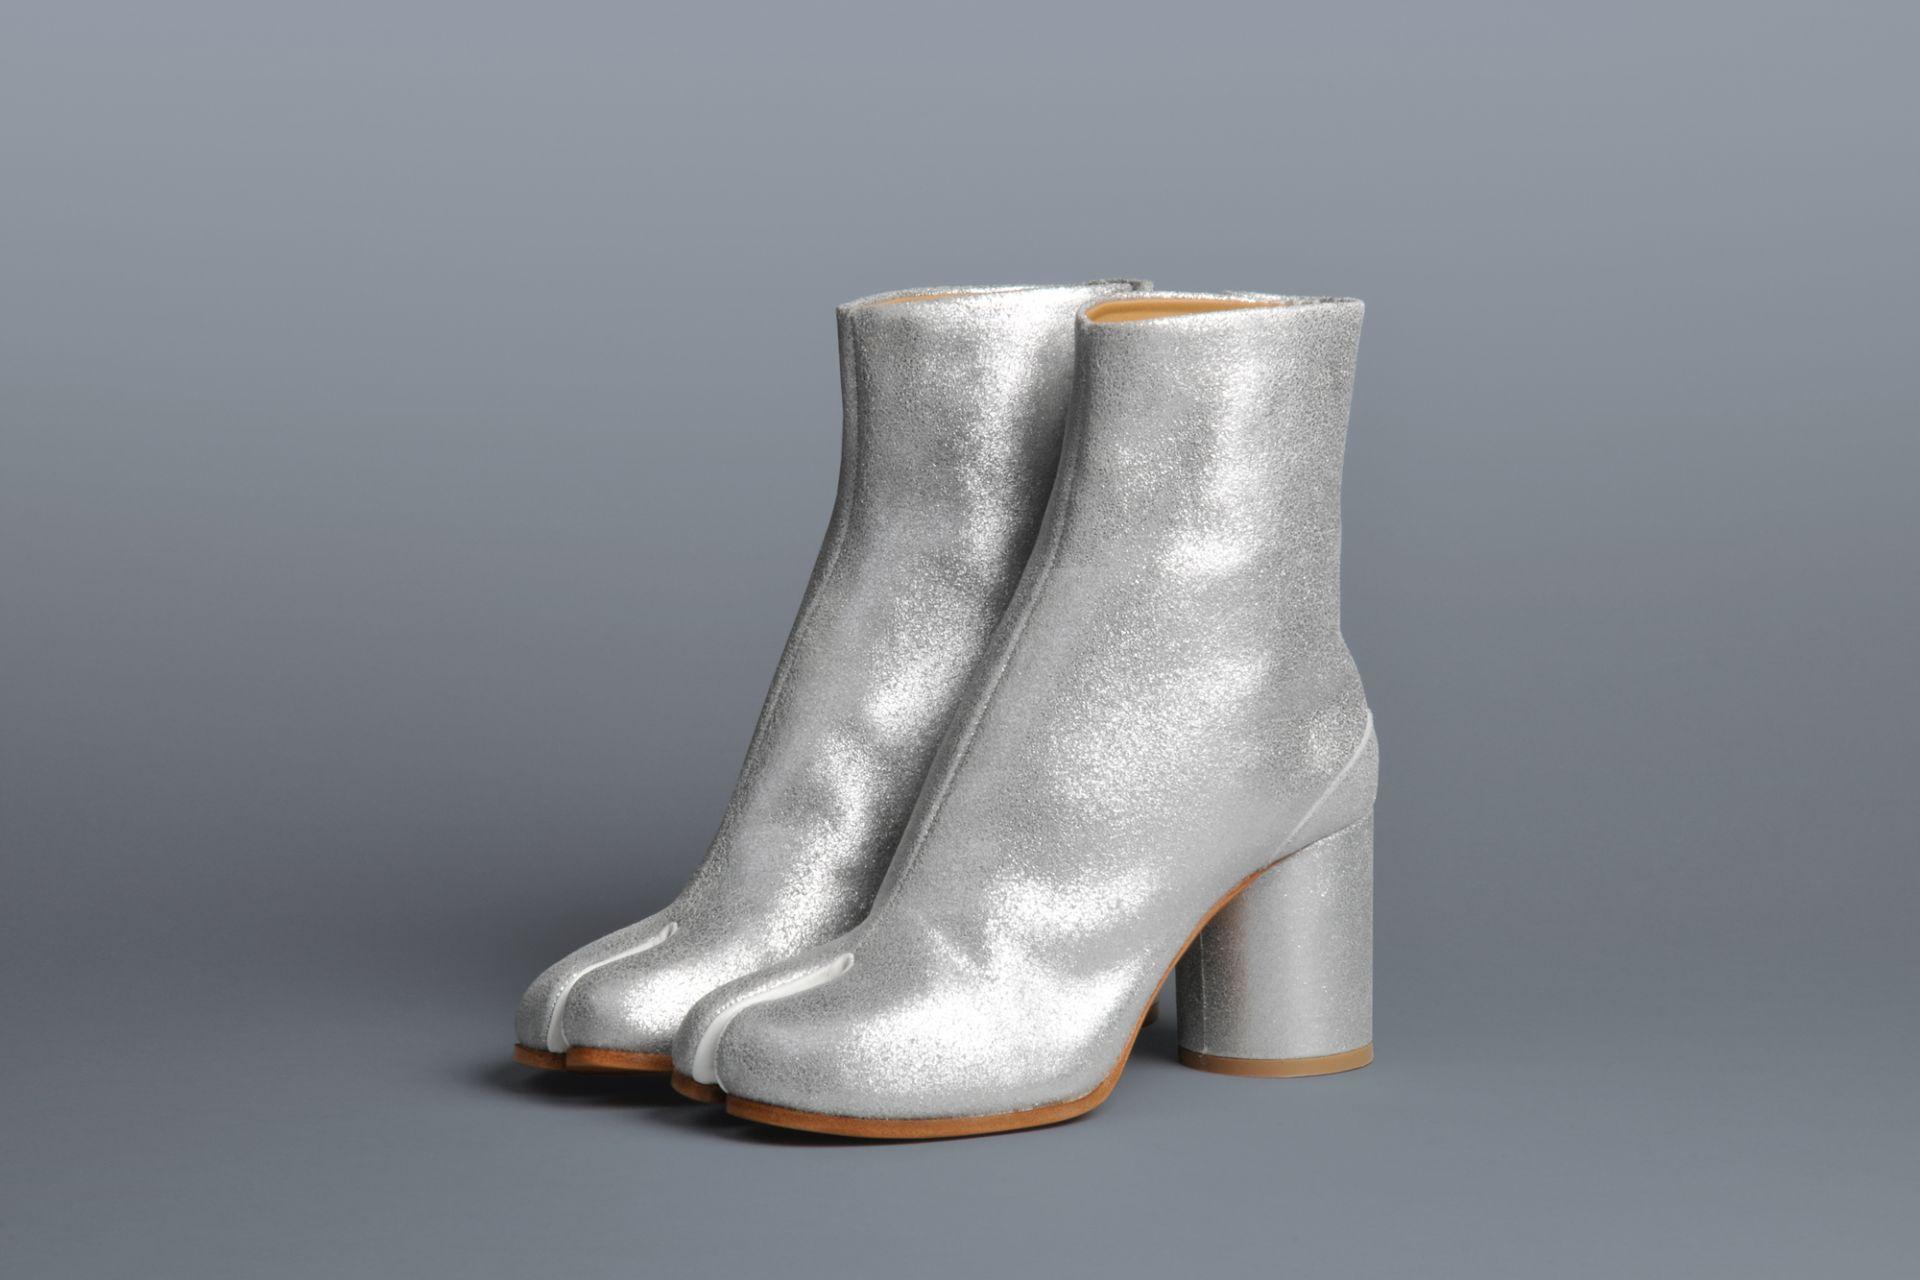 Tabi Split-Toe-boots, Maison Martin Margiela, Paris, France, 2017